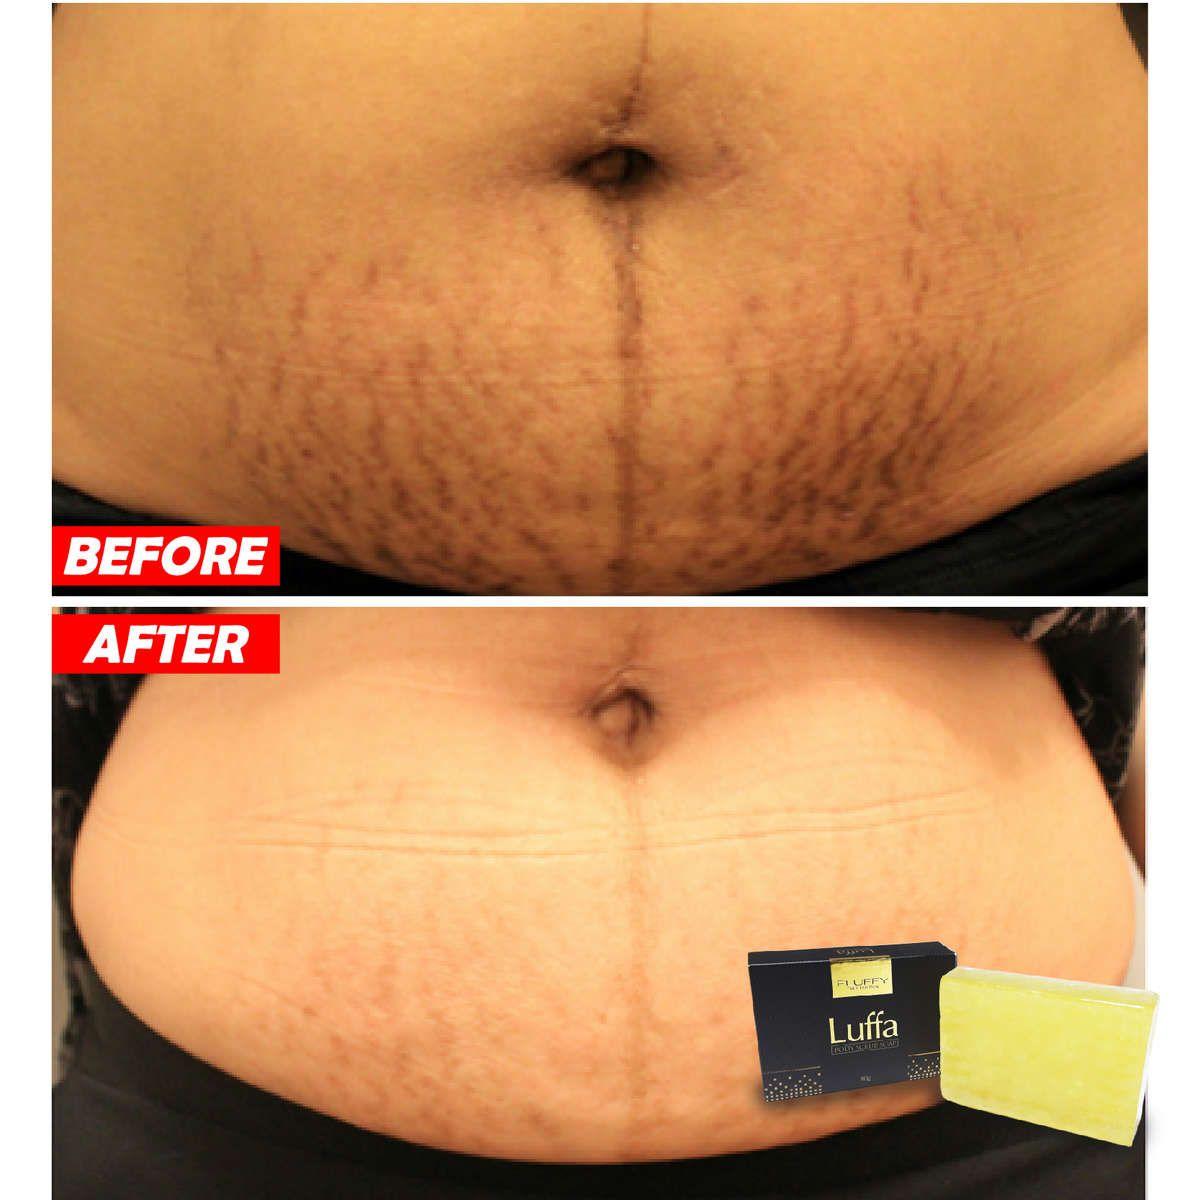 e8c2a07de6521e32f8aa193f8551689e - How To Get Rid Of Dirt Stains On Skin